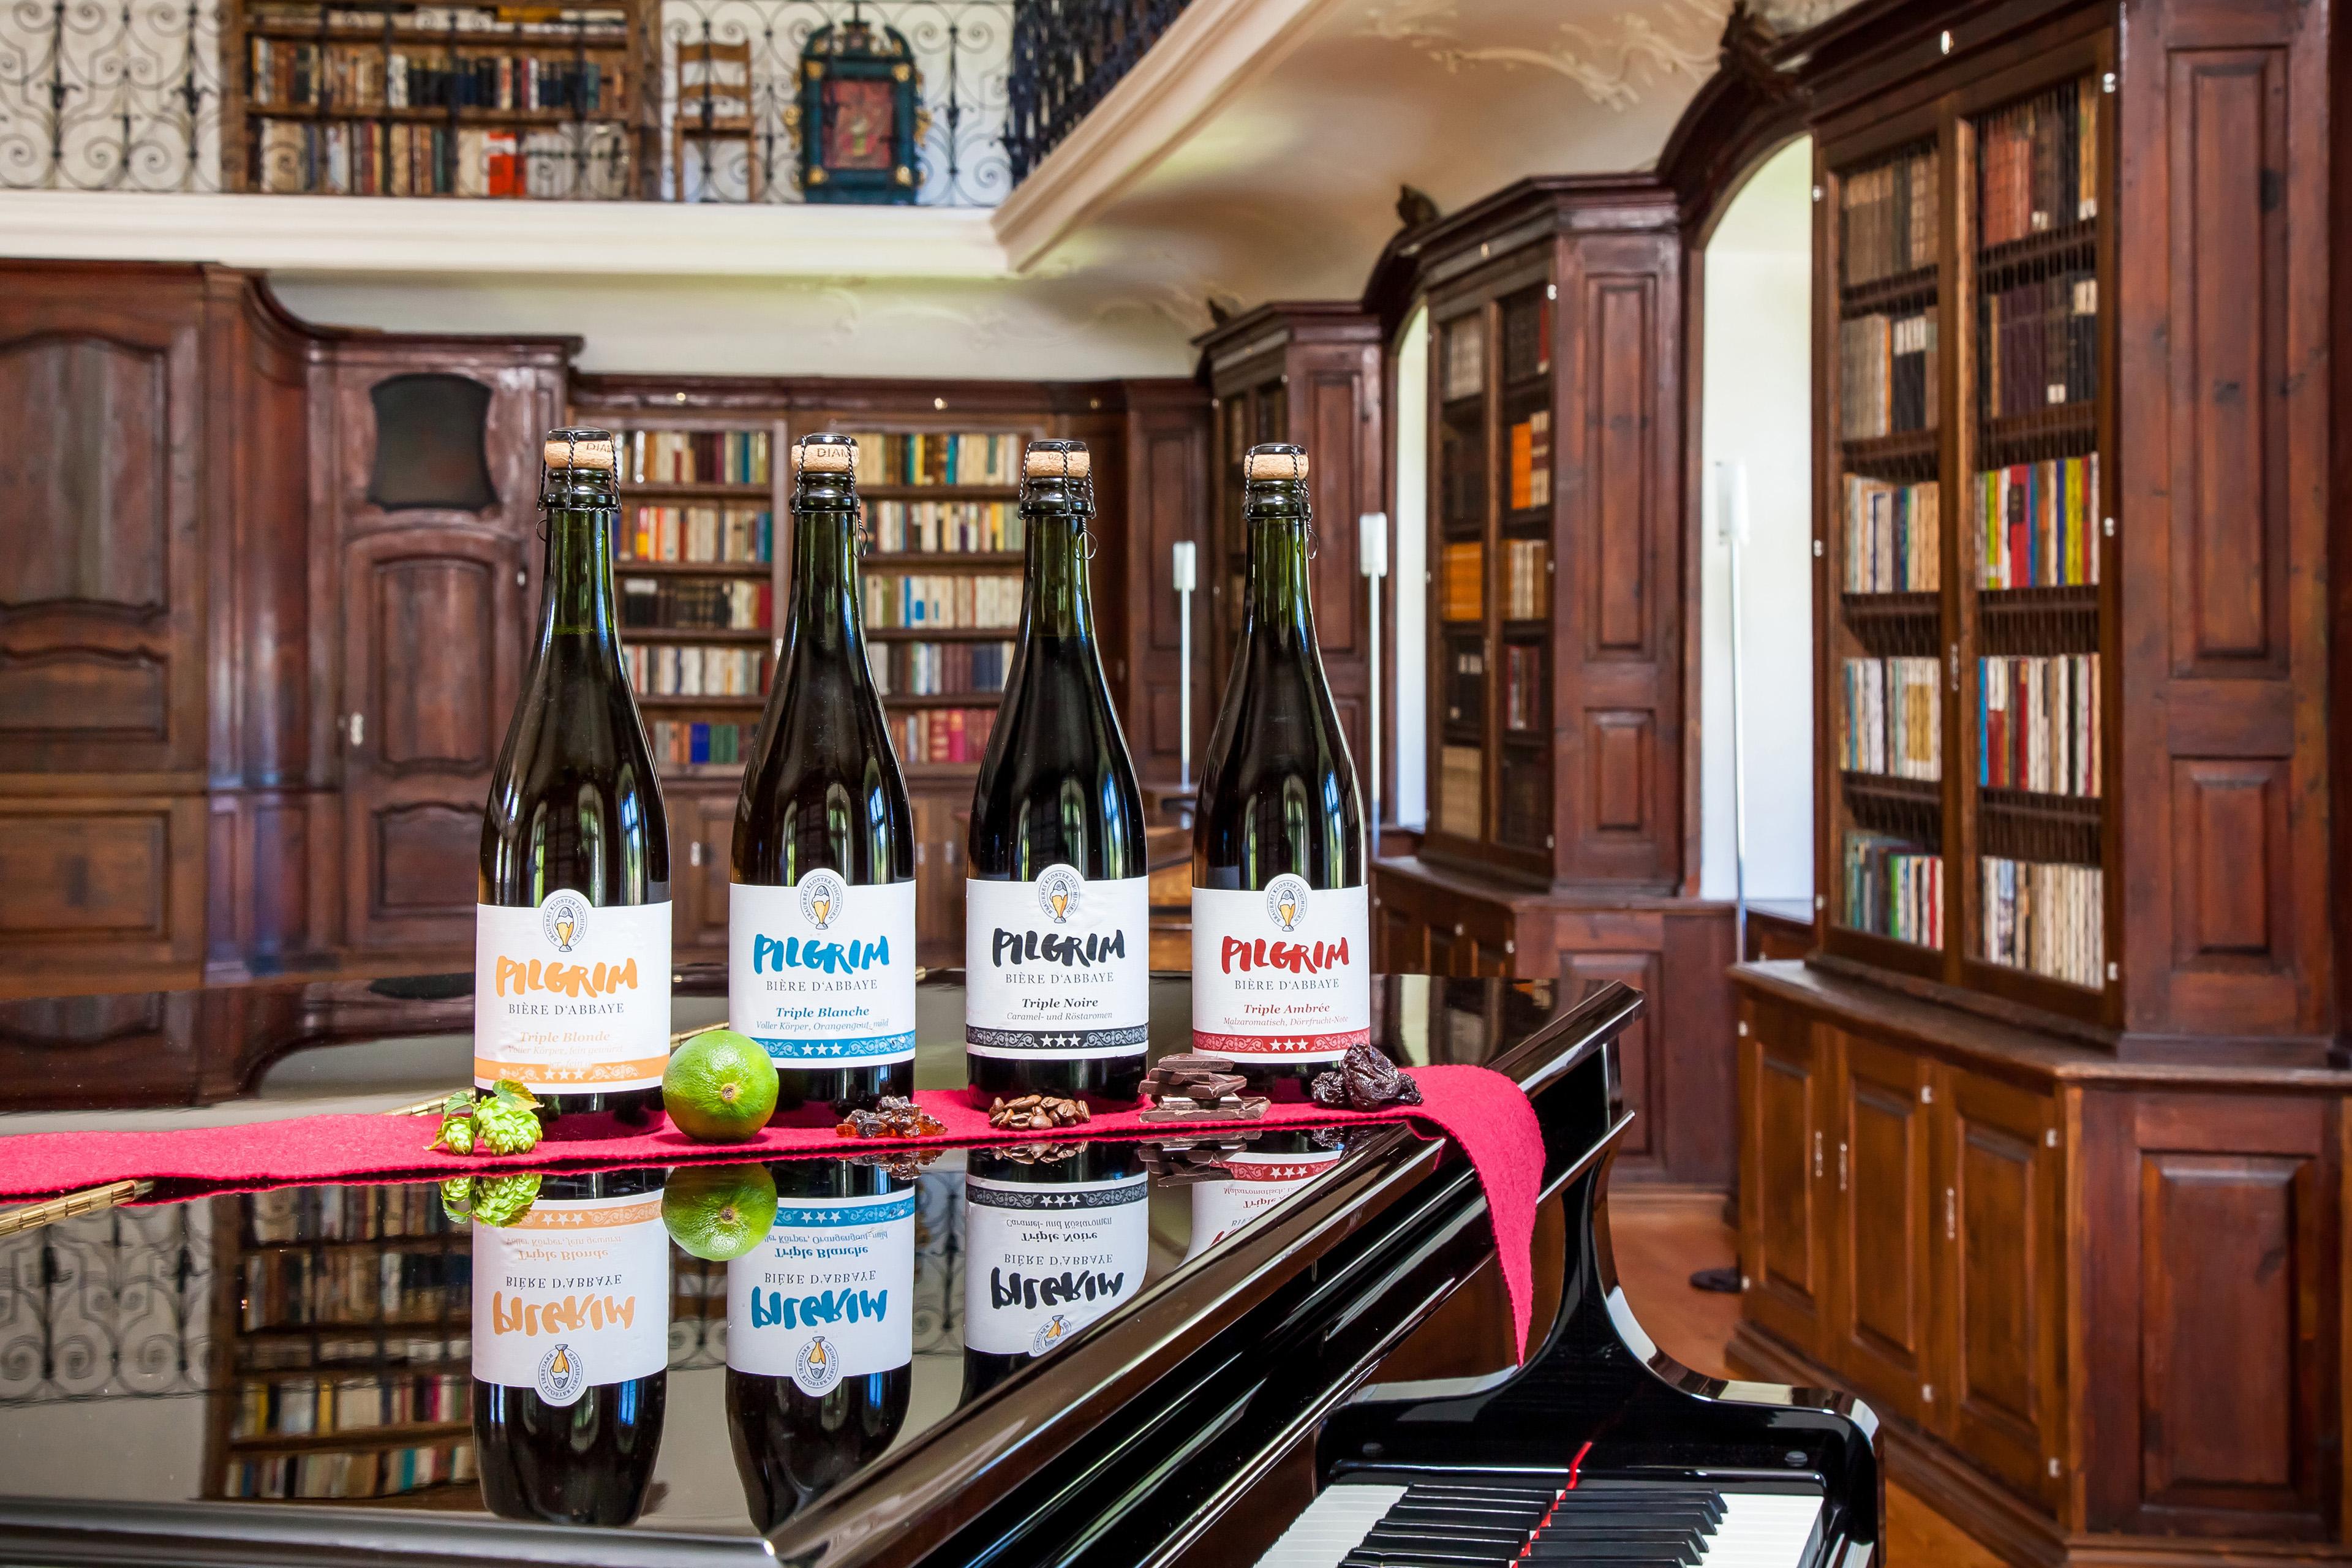 Bières d'Abbaye Triple 75cl Bibliothek Kloster Fischingen